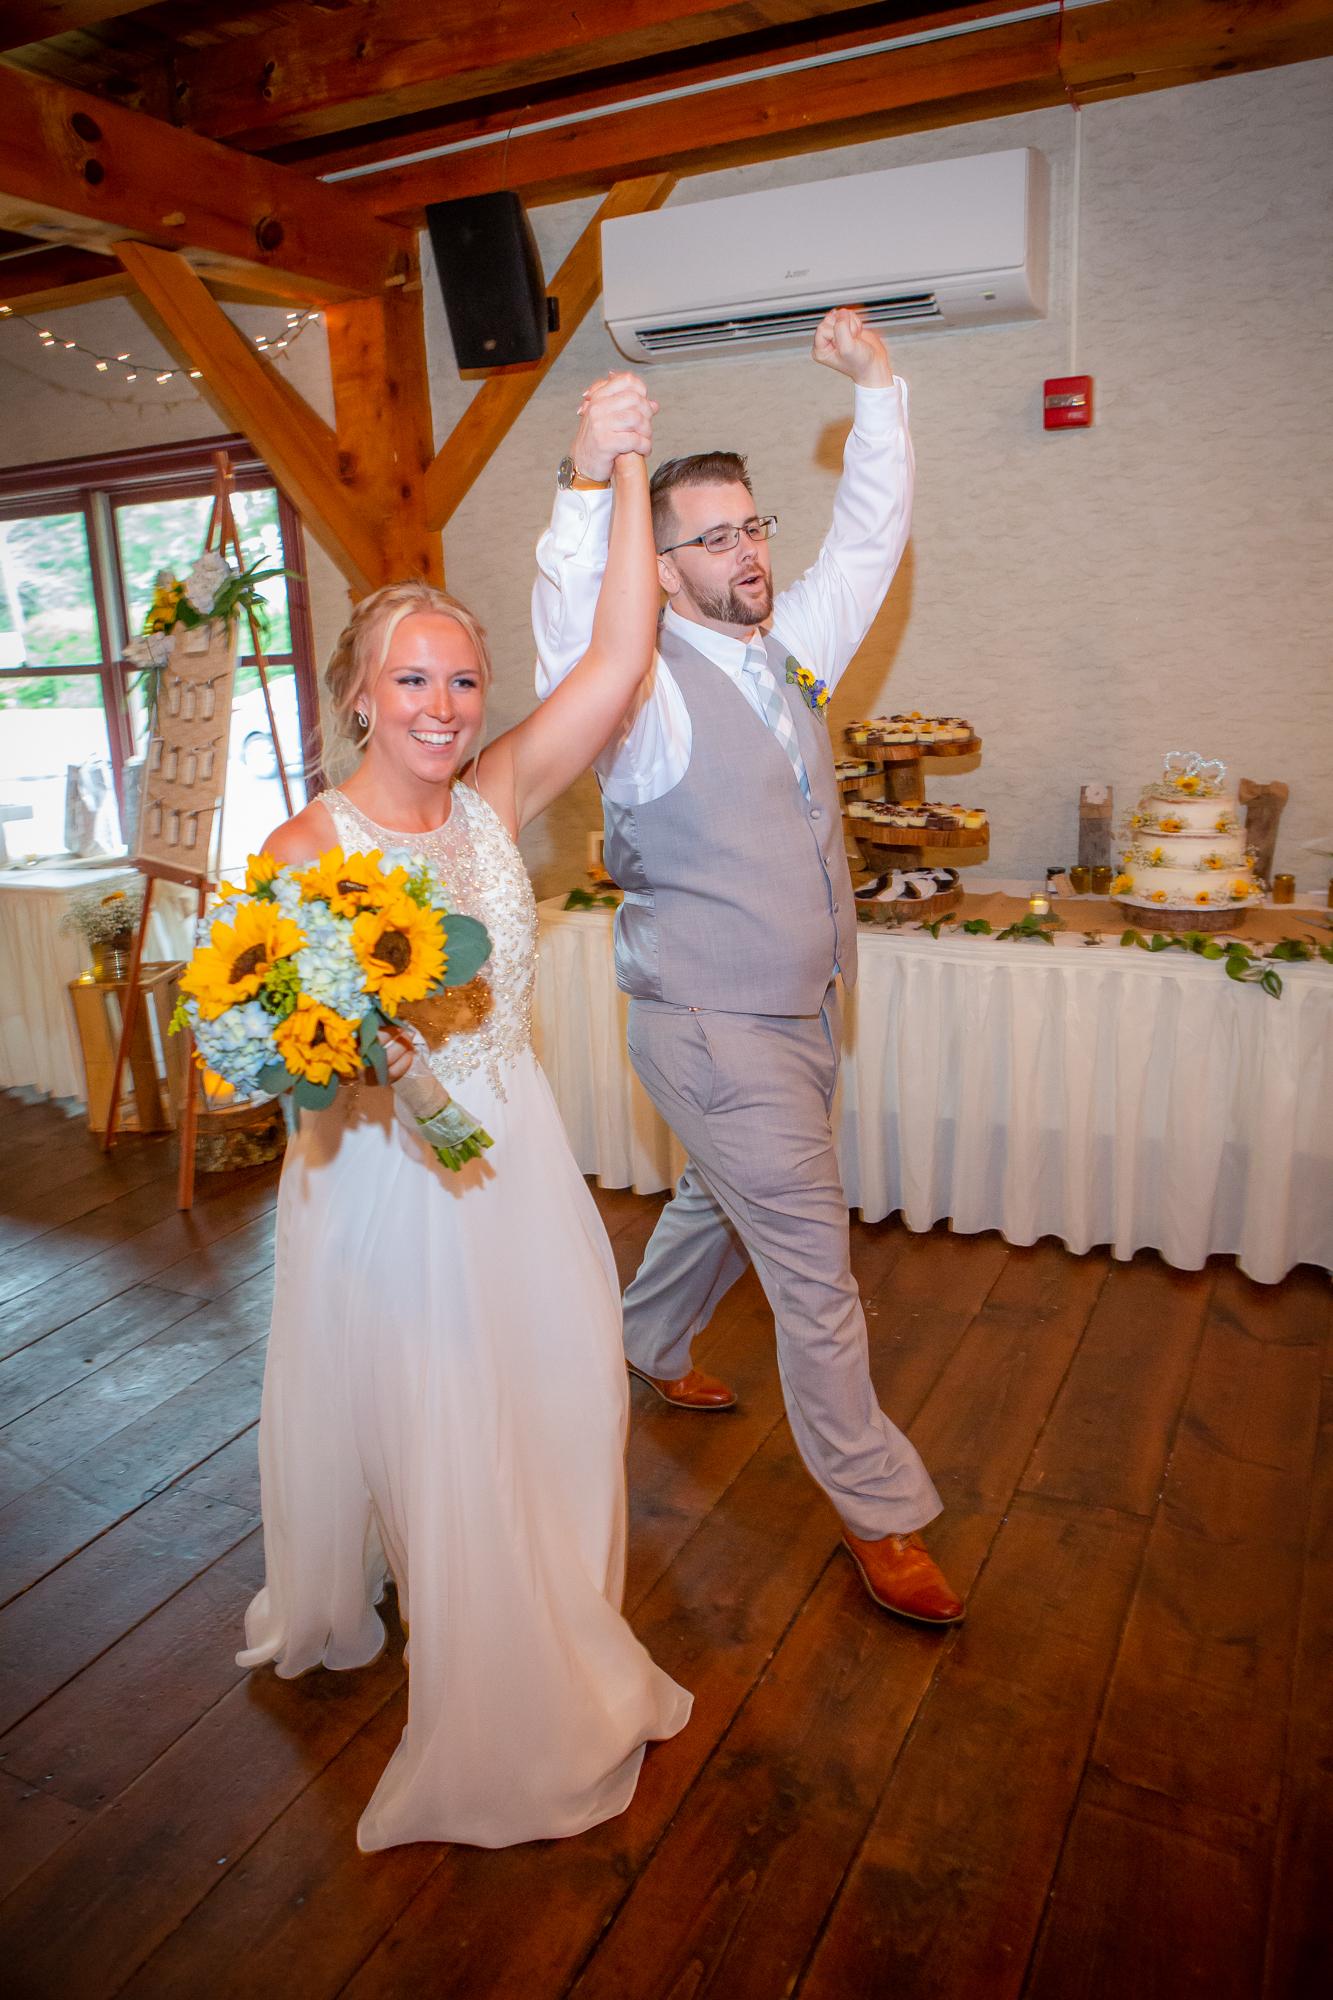 Wedding-Carriage-House-Oneonta-NY-0880.jpg